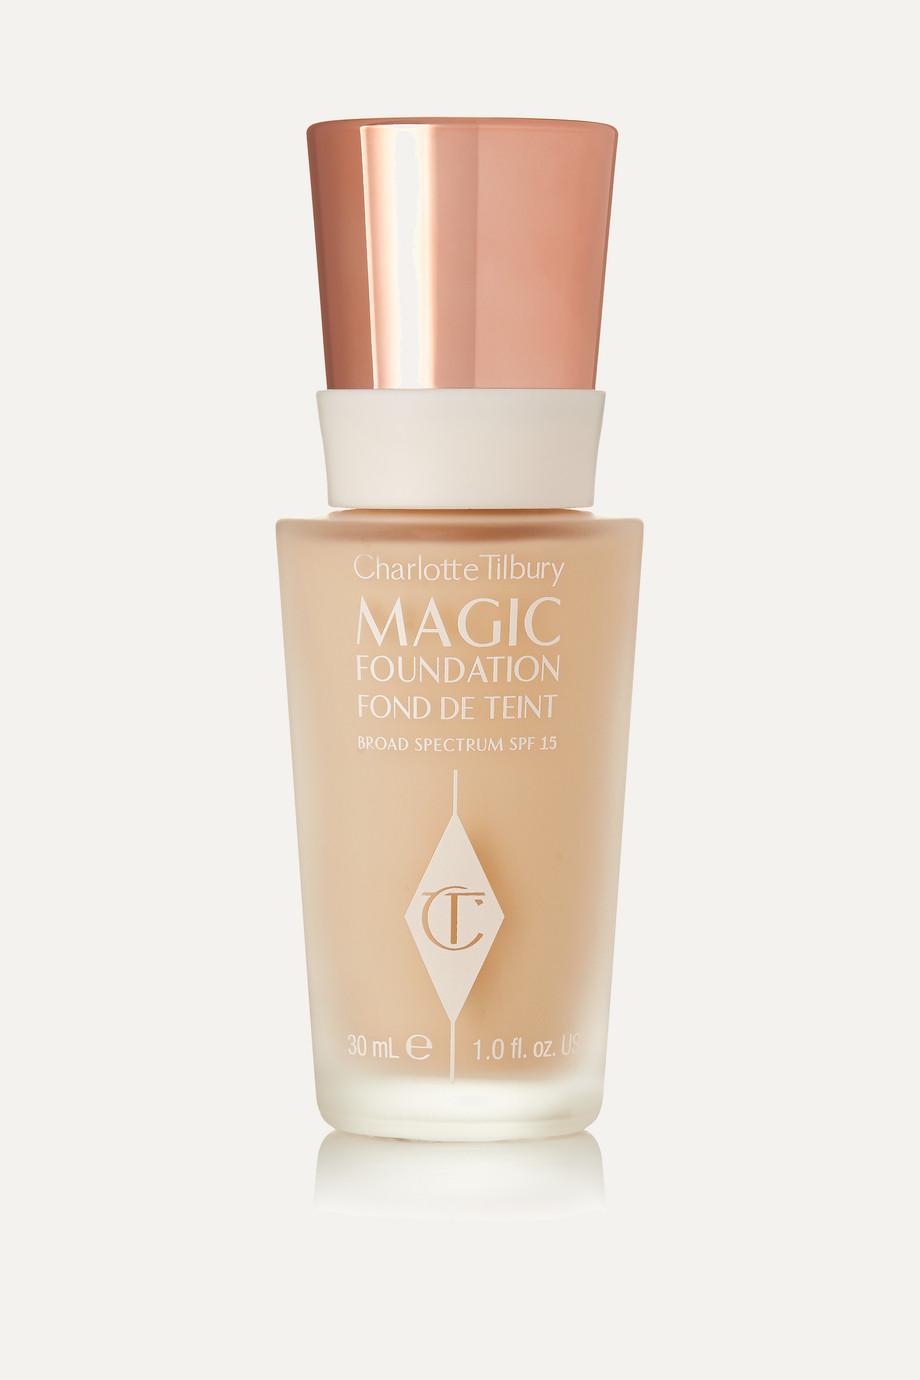 Charlotte Tilbury Magic Foundation Flawless Long-Lasting Coverage SPF15 - Shade 2, 30ml